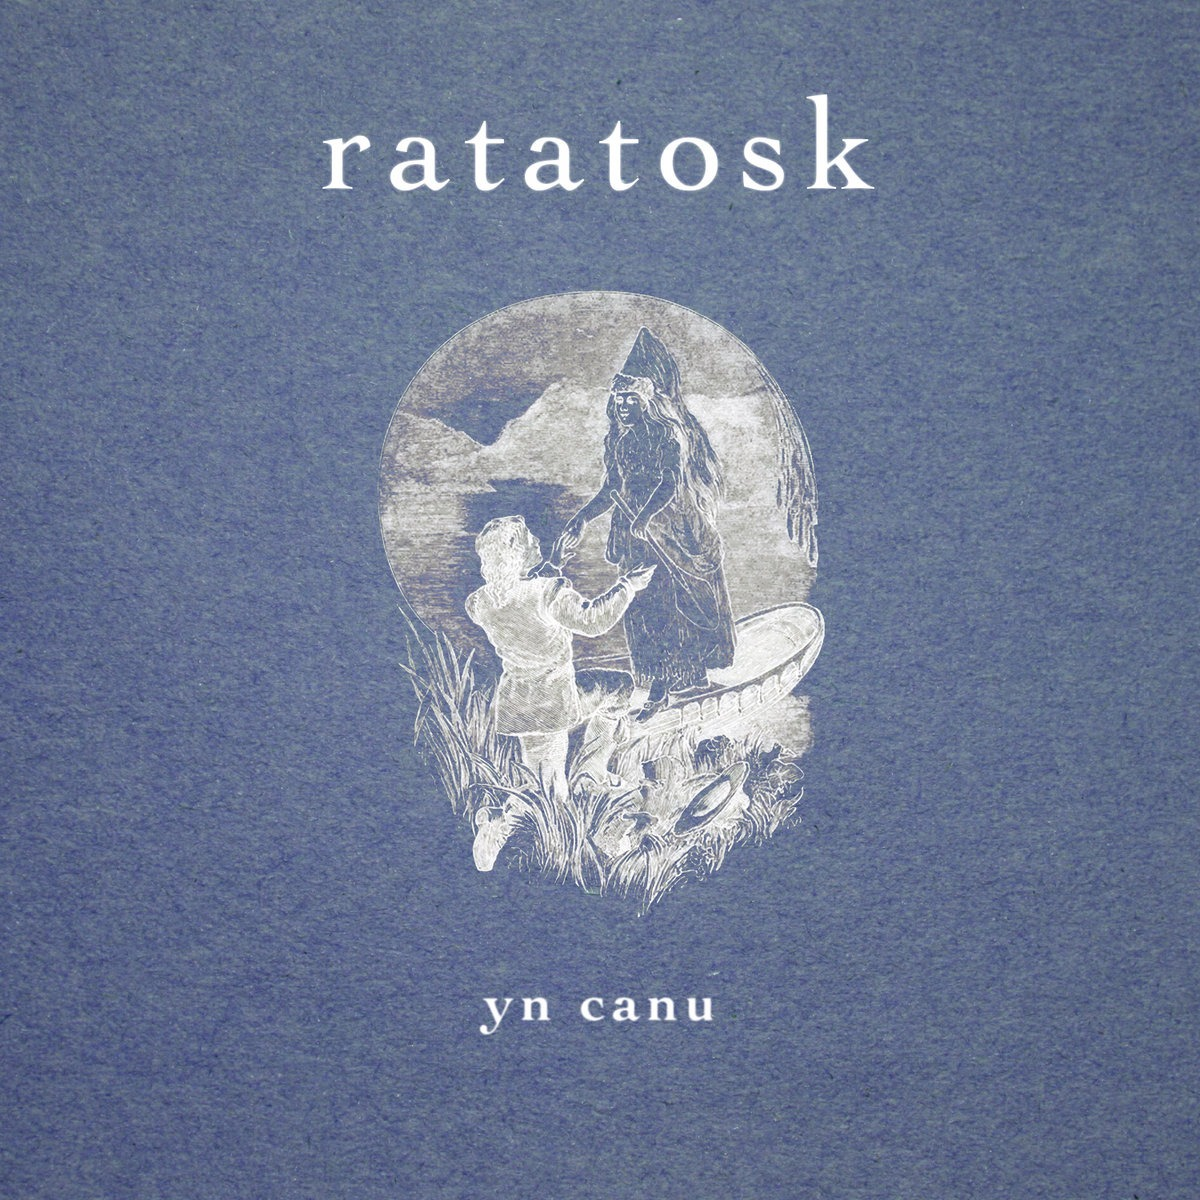 Ratatosk – Yn Canu (Self Released)